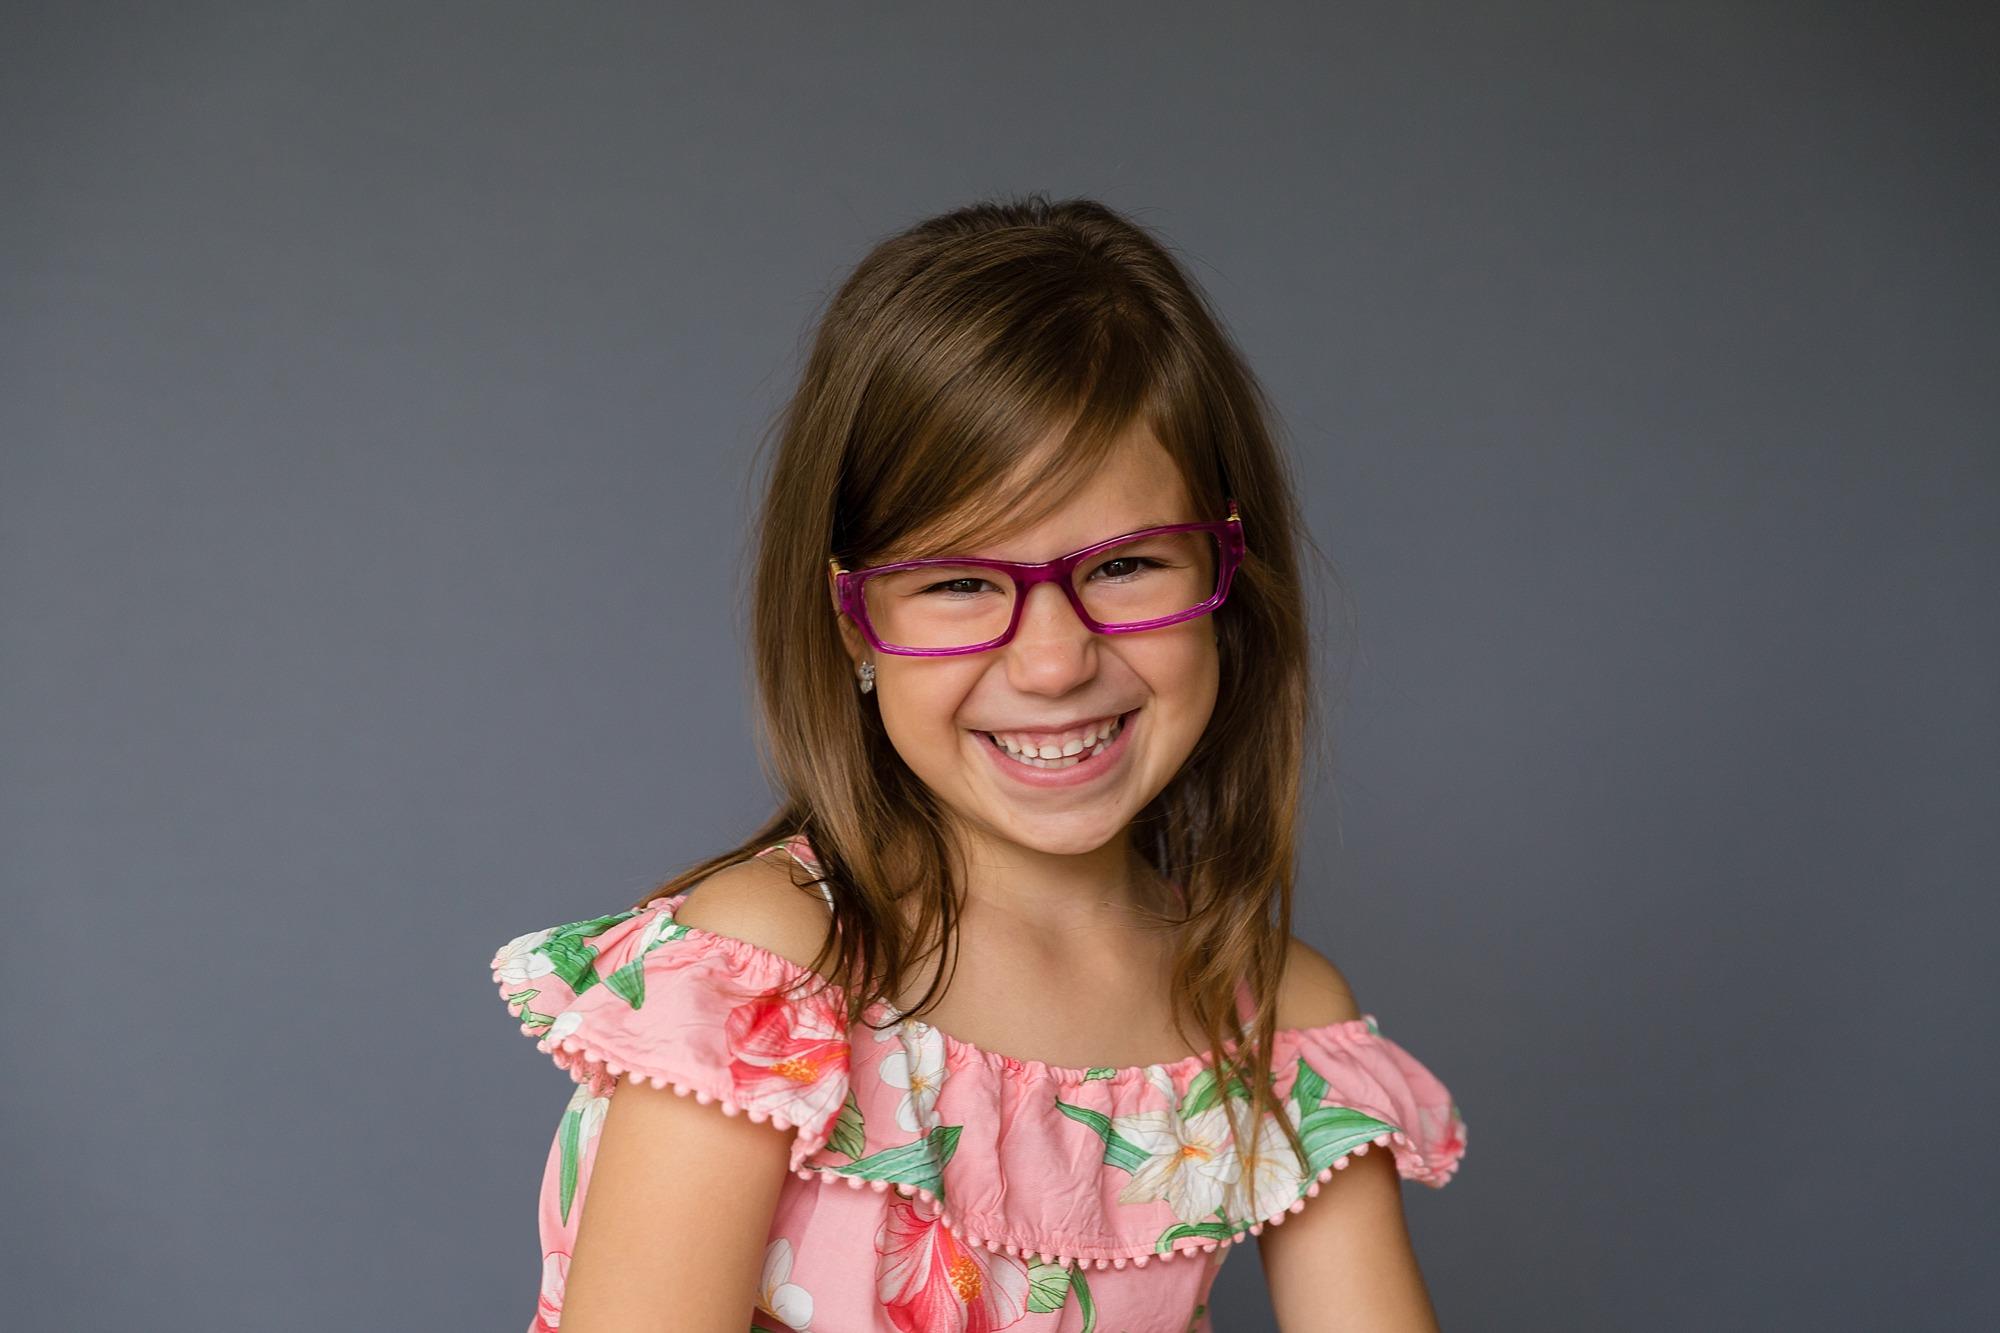 Modern_Childrens_Portraits_Hunnicutt_Photography_Collages_0001